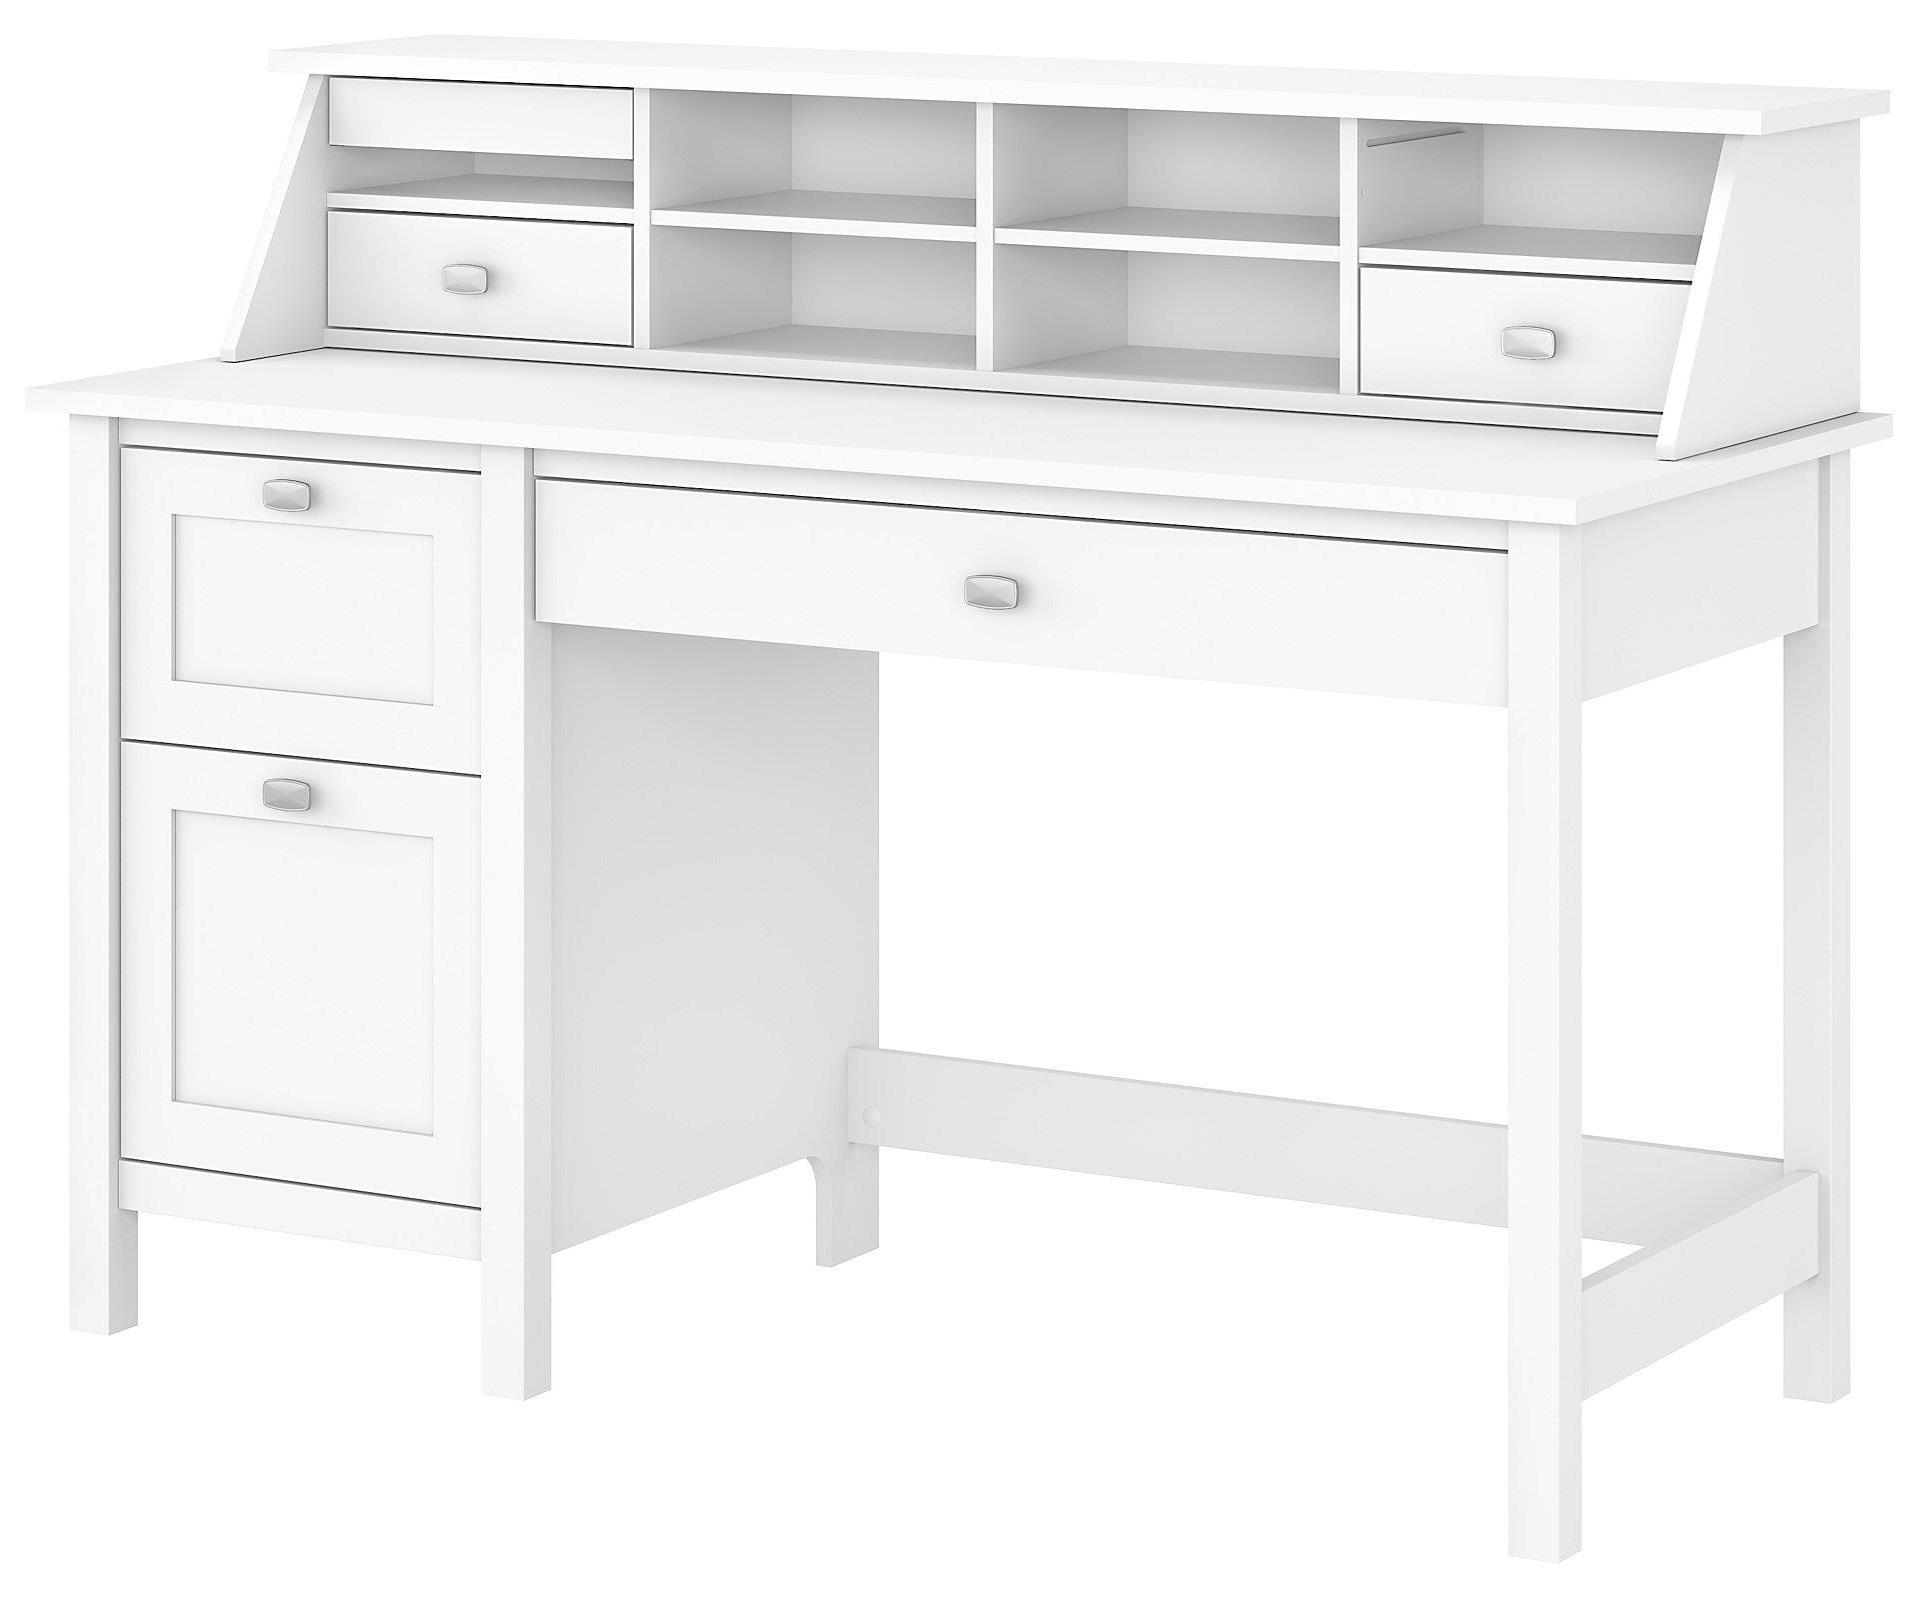 Bush Broadview Computer Desk With 2 Drawer Pedestal And Organizer Value City Furniture Single Pedestal Desks